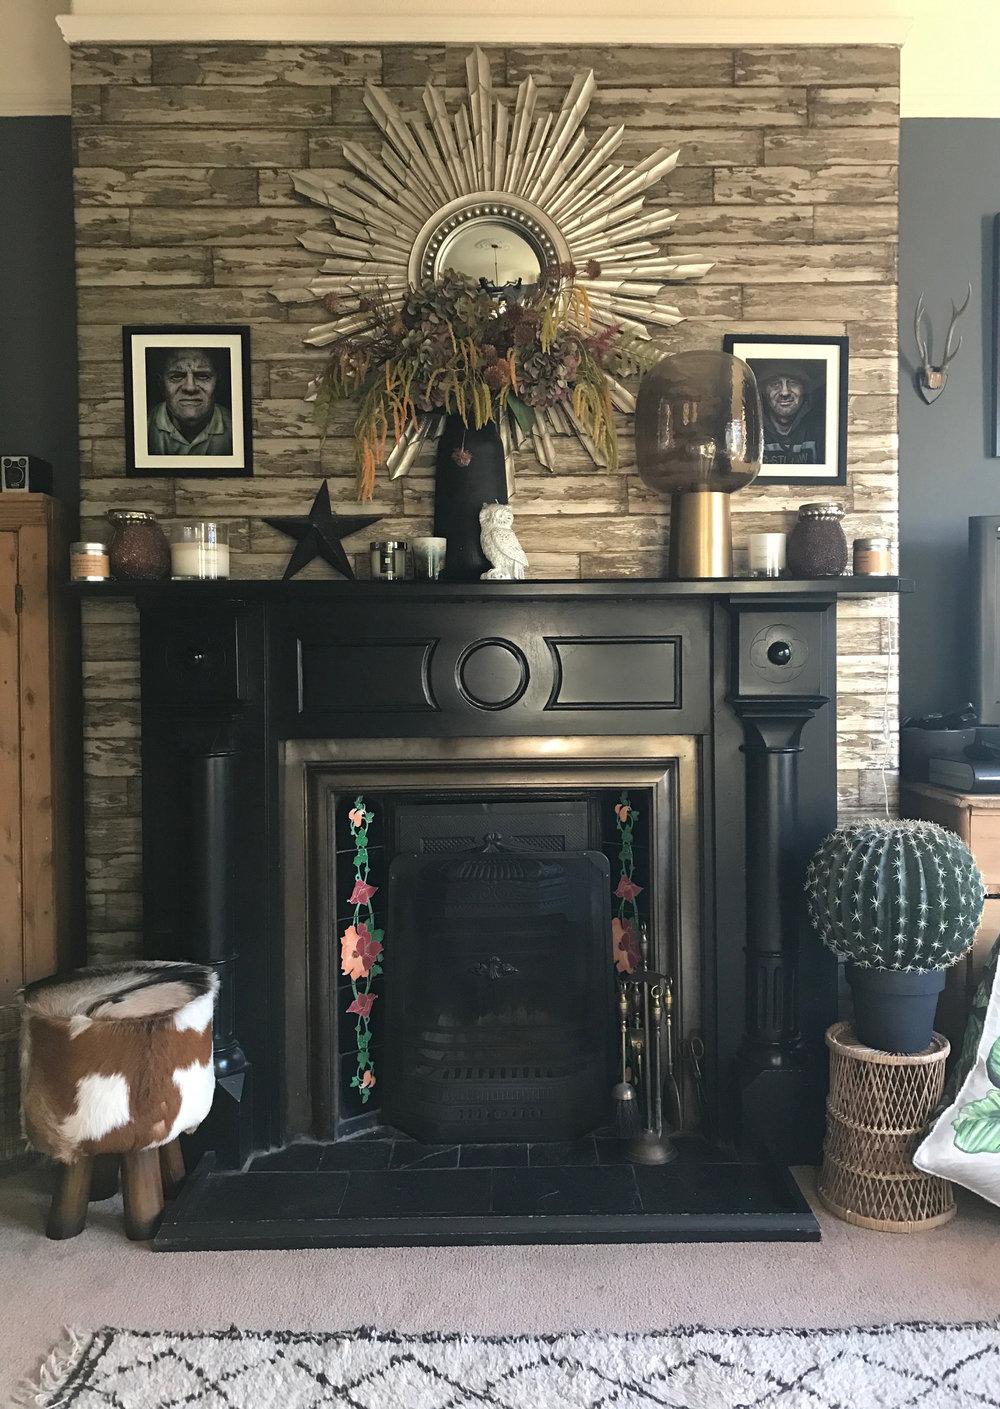 My Fireplace pre-christmas decor